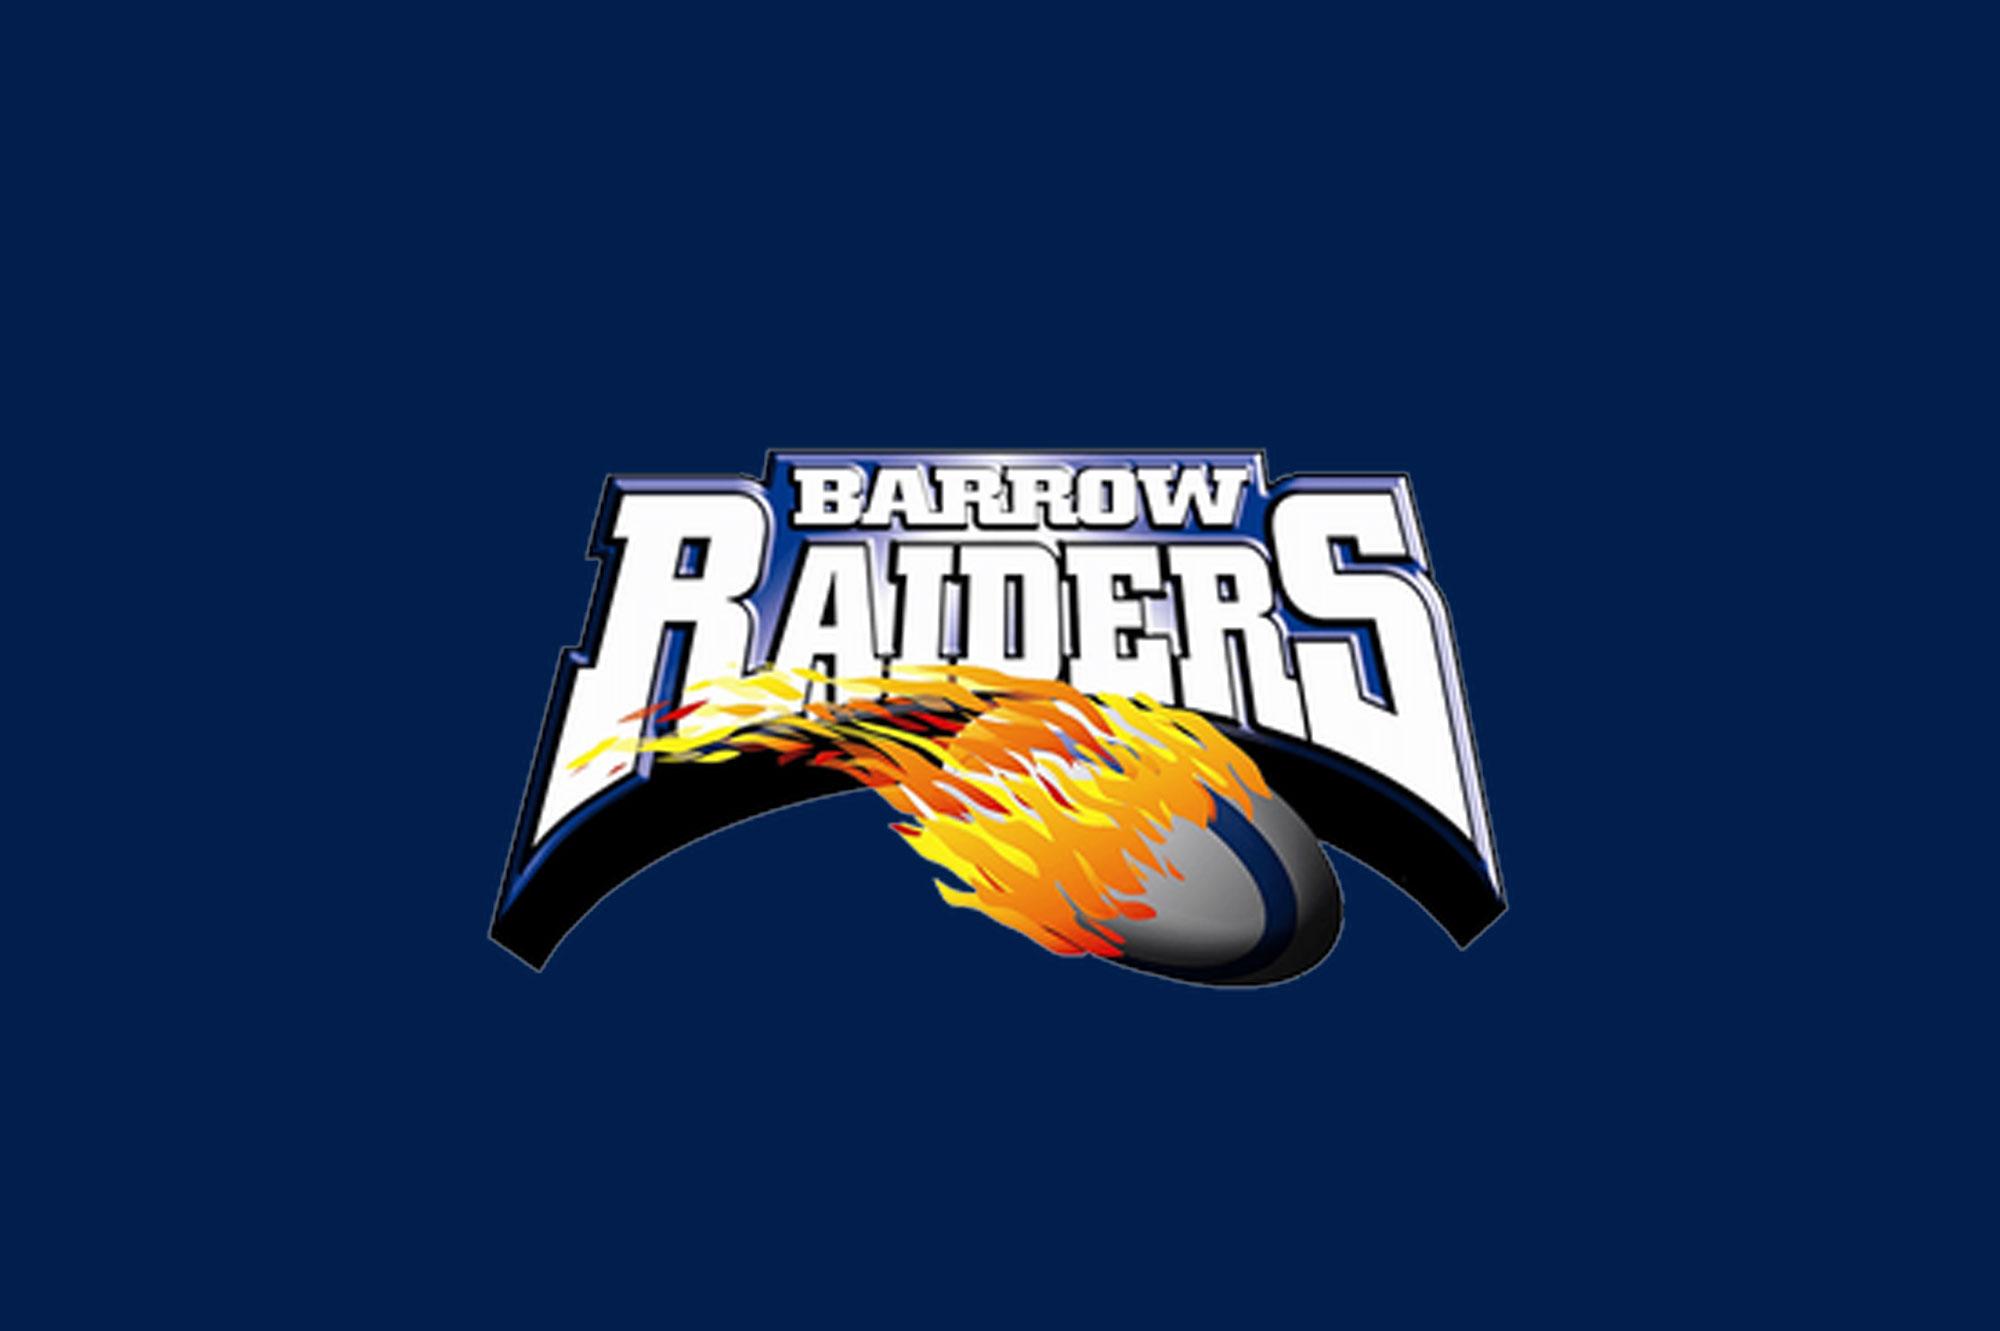 Barrow Raiders Logo